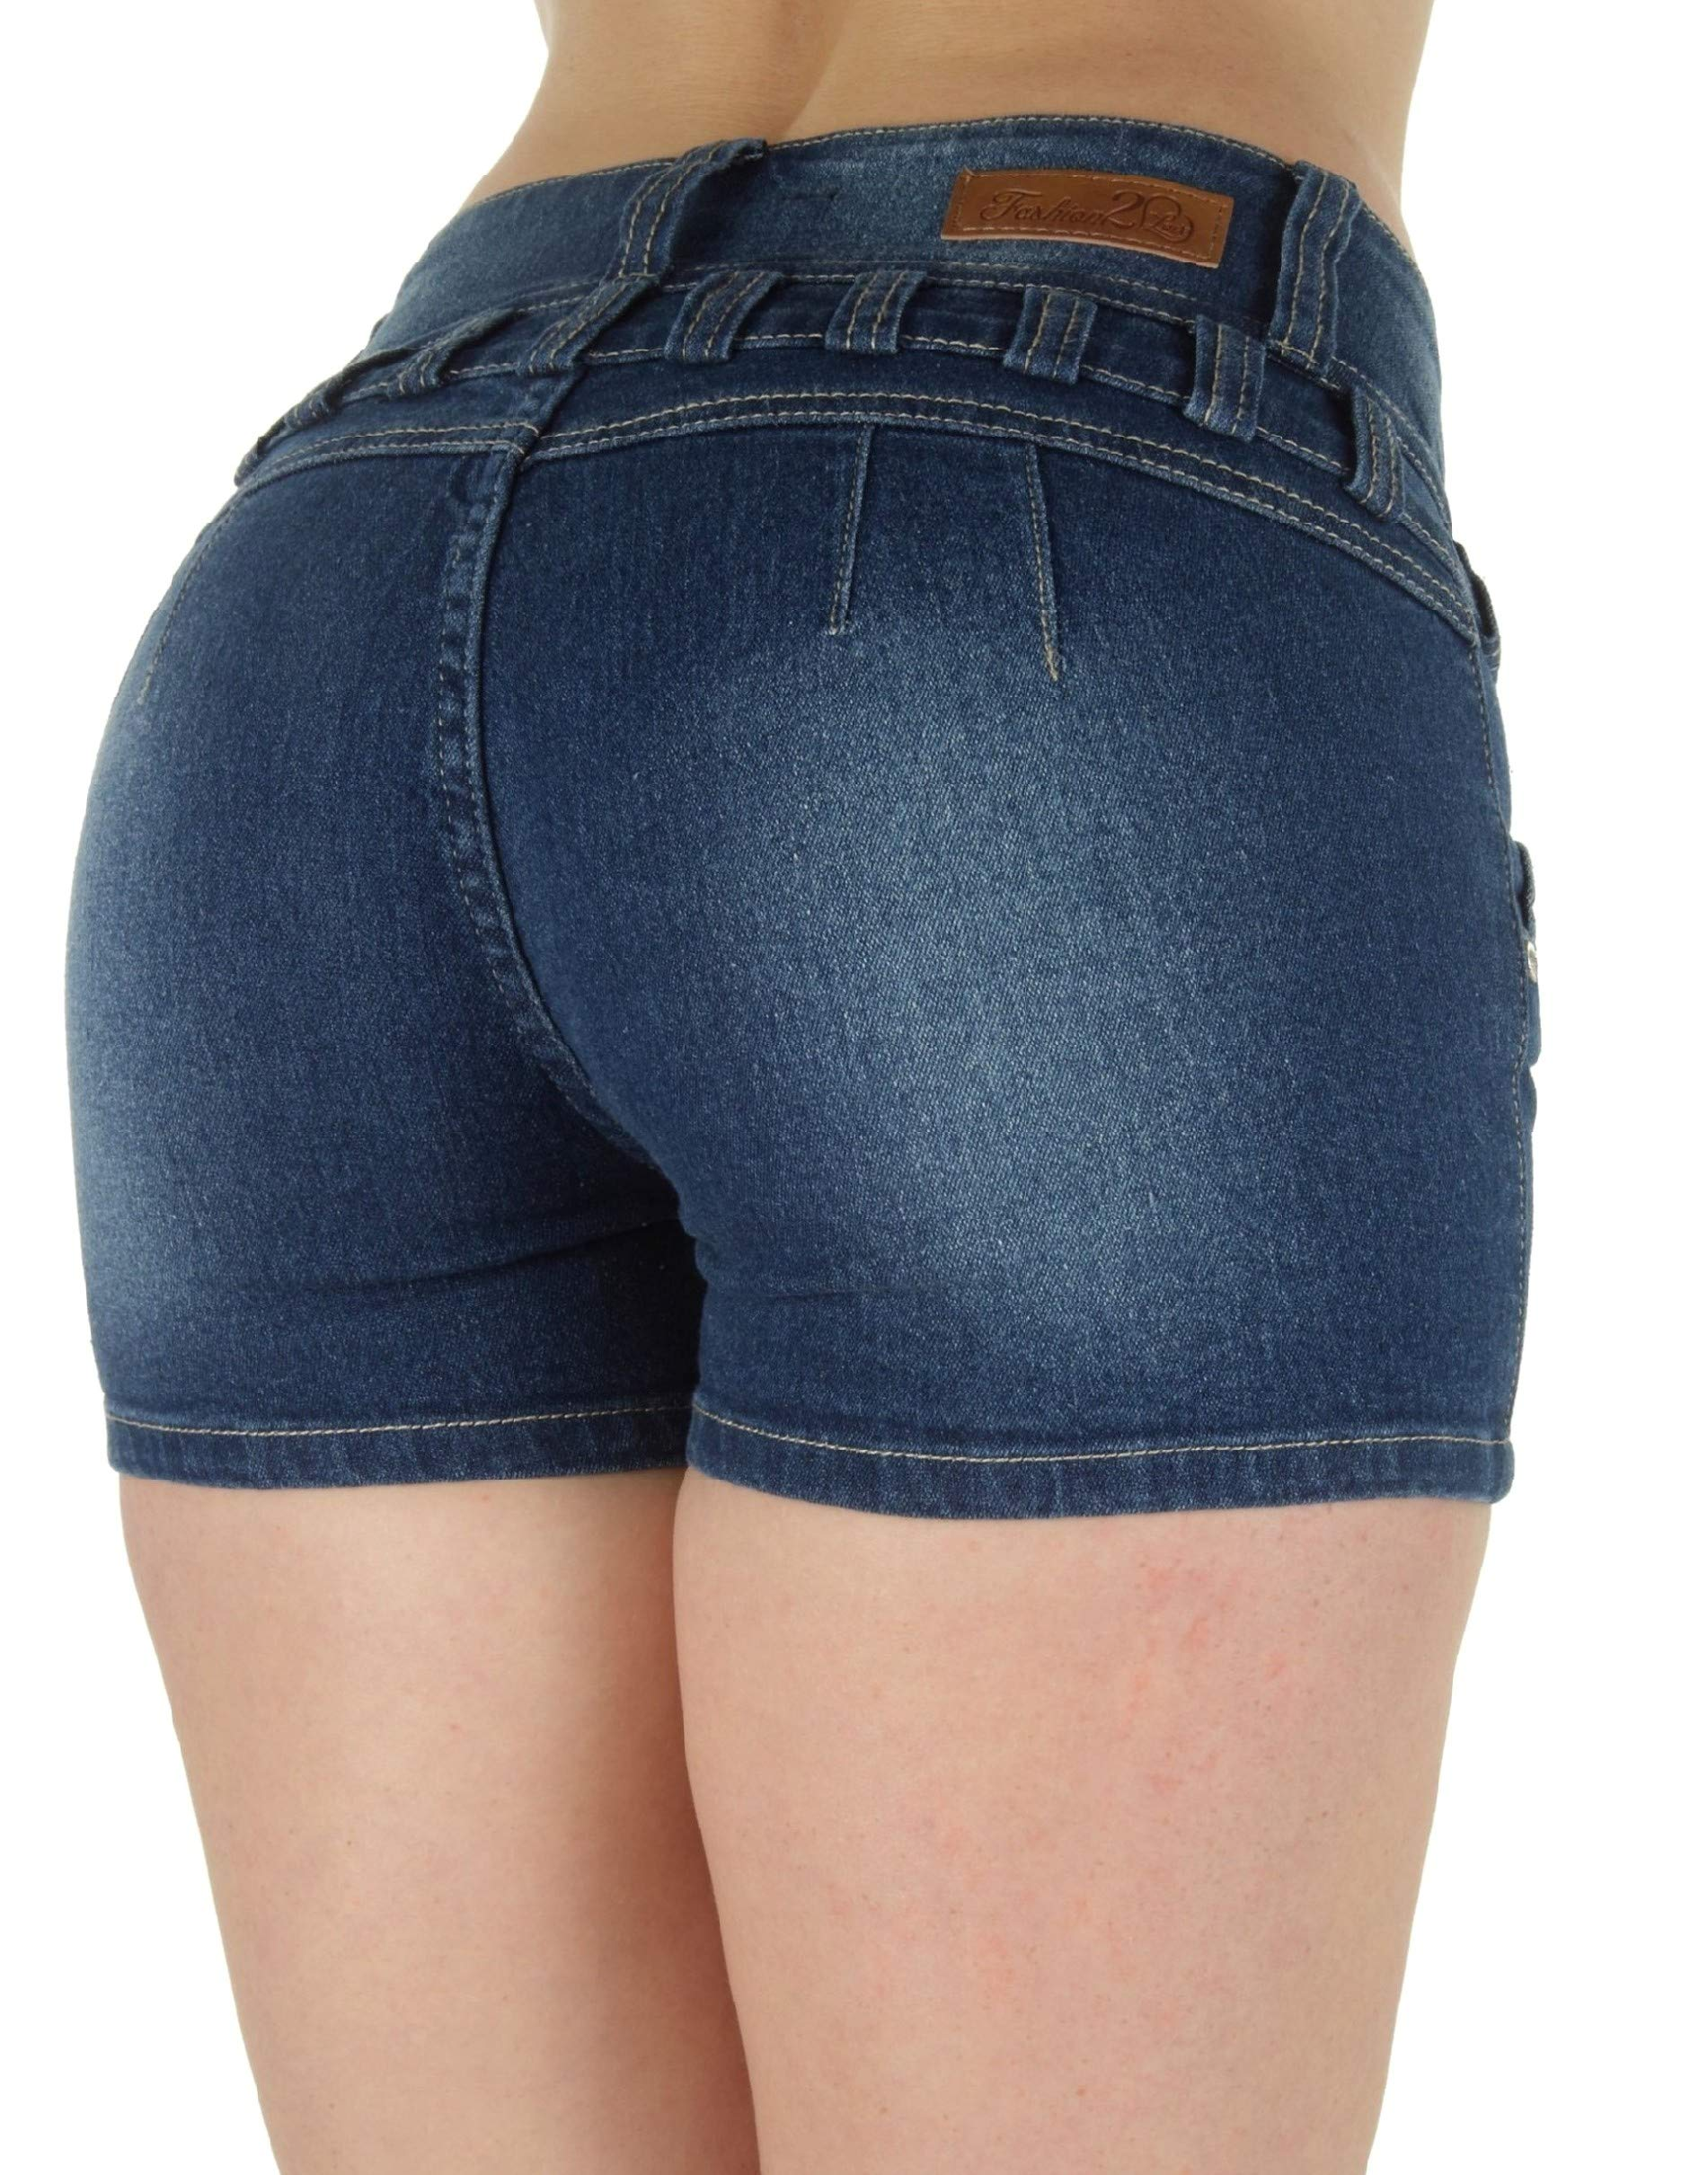 Fashion2Love M1213SH-P – Plus Size, Butt Lifting, Levanta Cola, High Waist Denim Booty Shorts in Navy Size 14